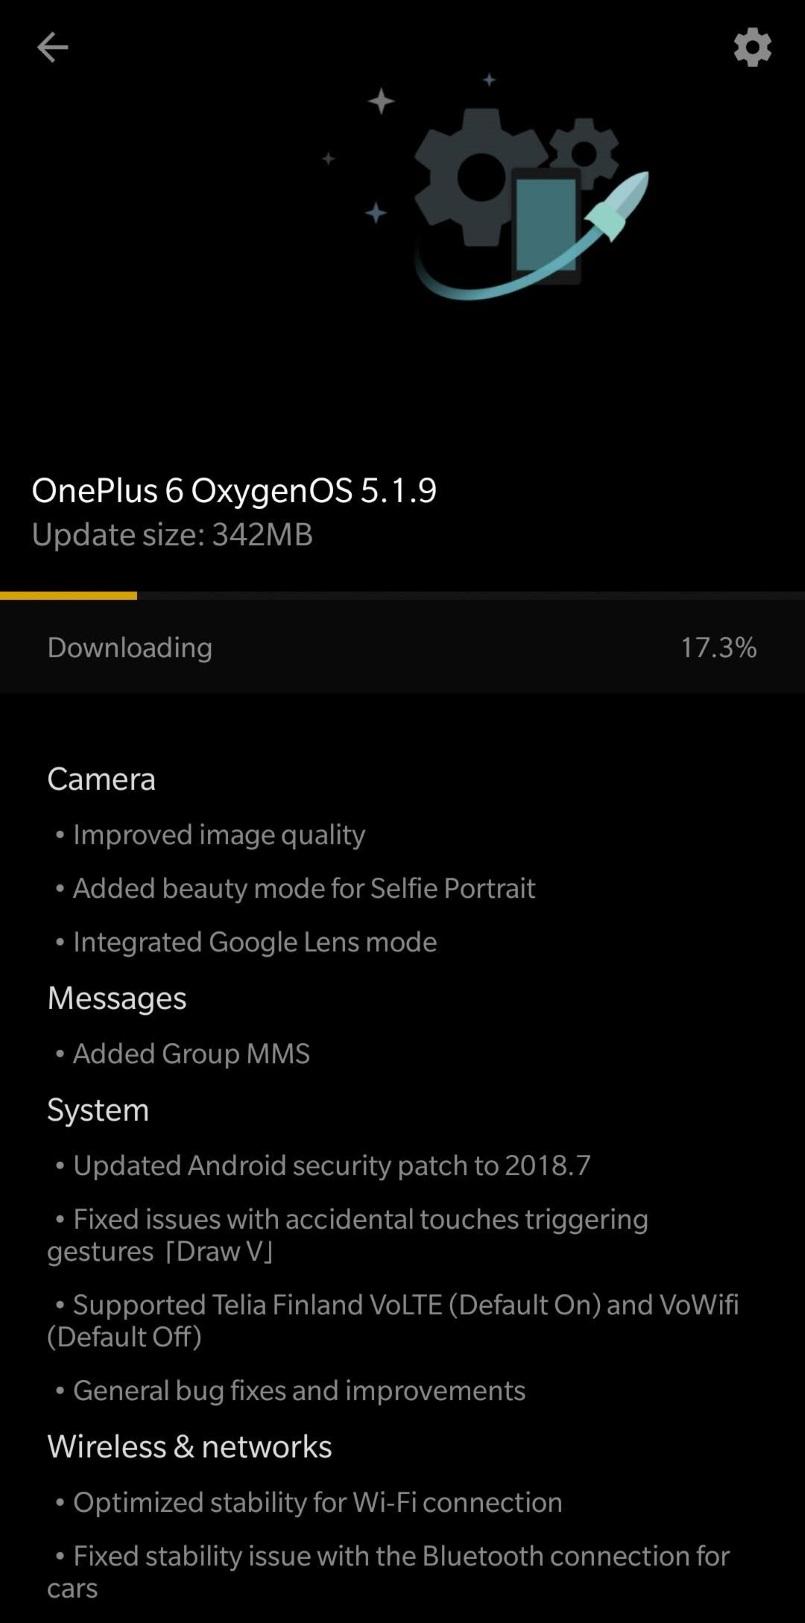 OxygenOS 5.1.9